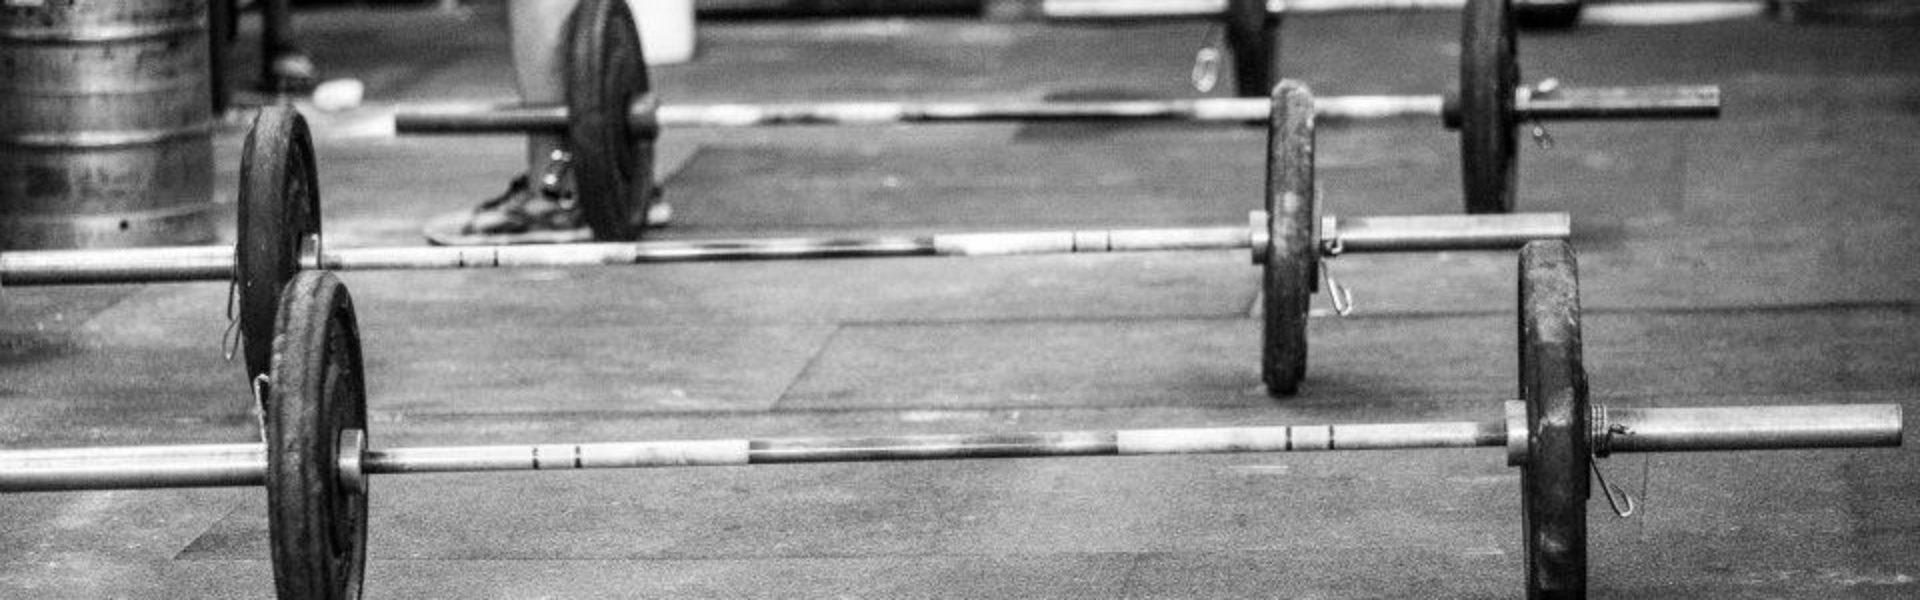 Cropped Gym Monochrome Barbells Hd Wallpaper 879050